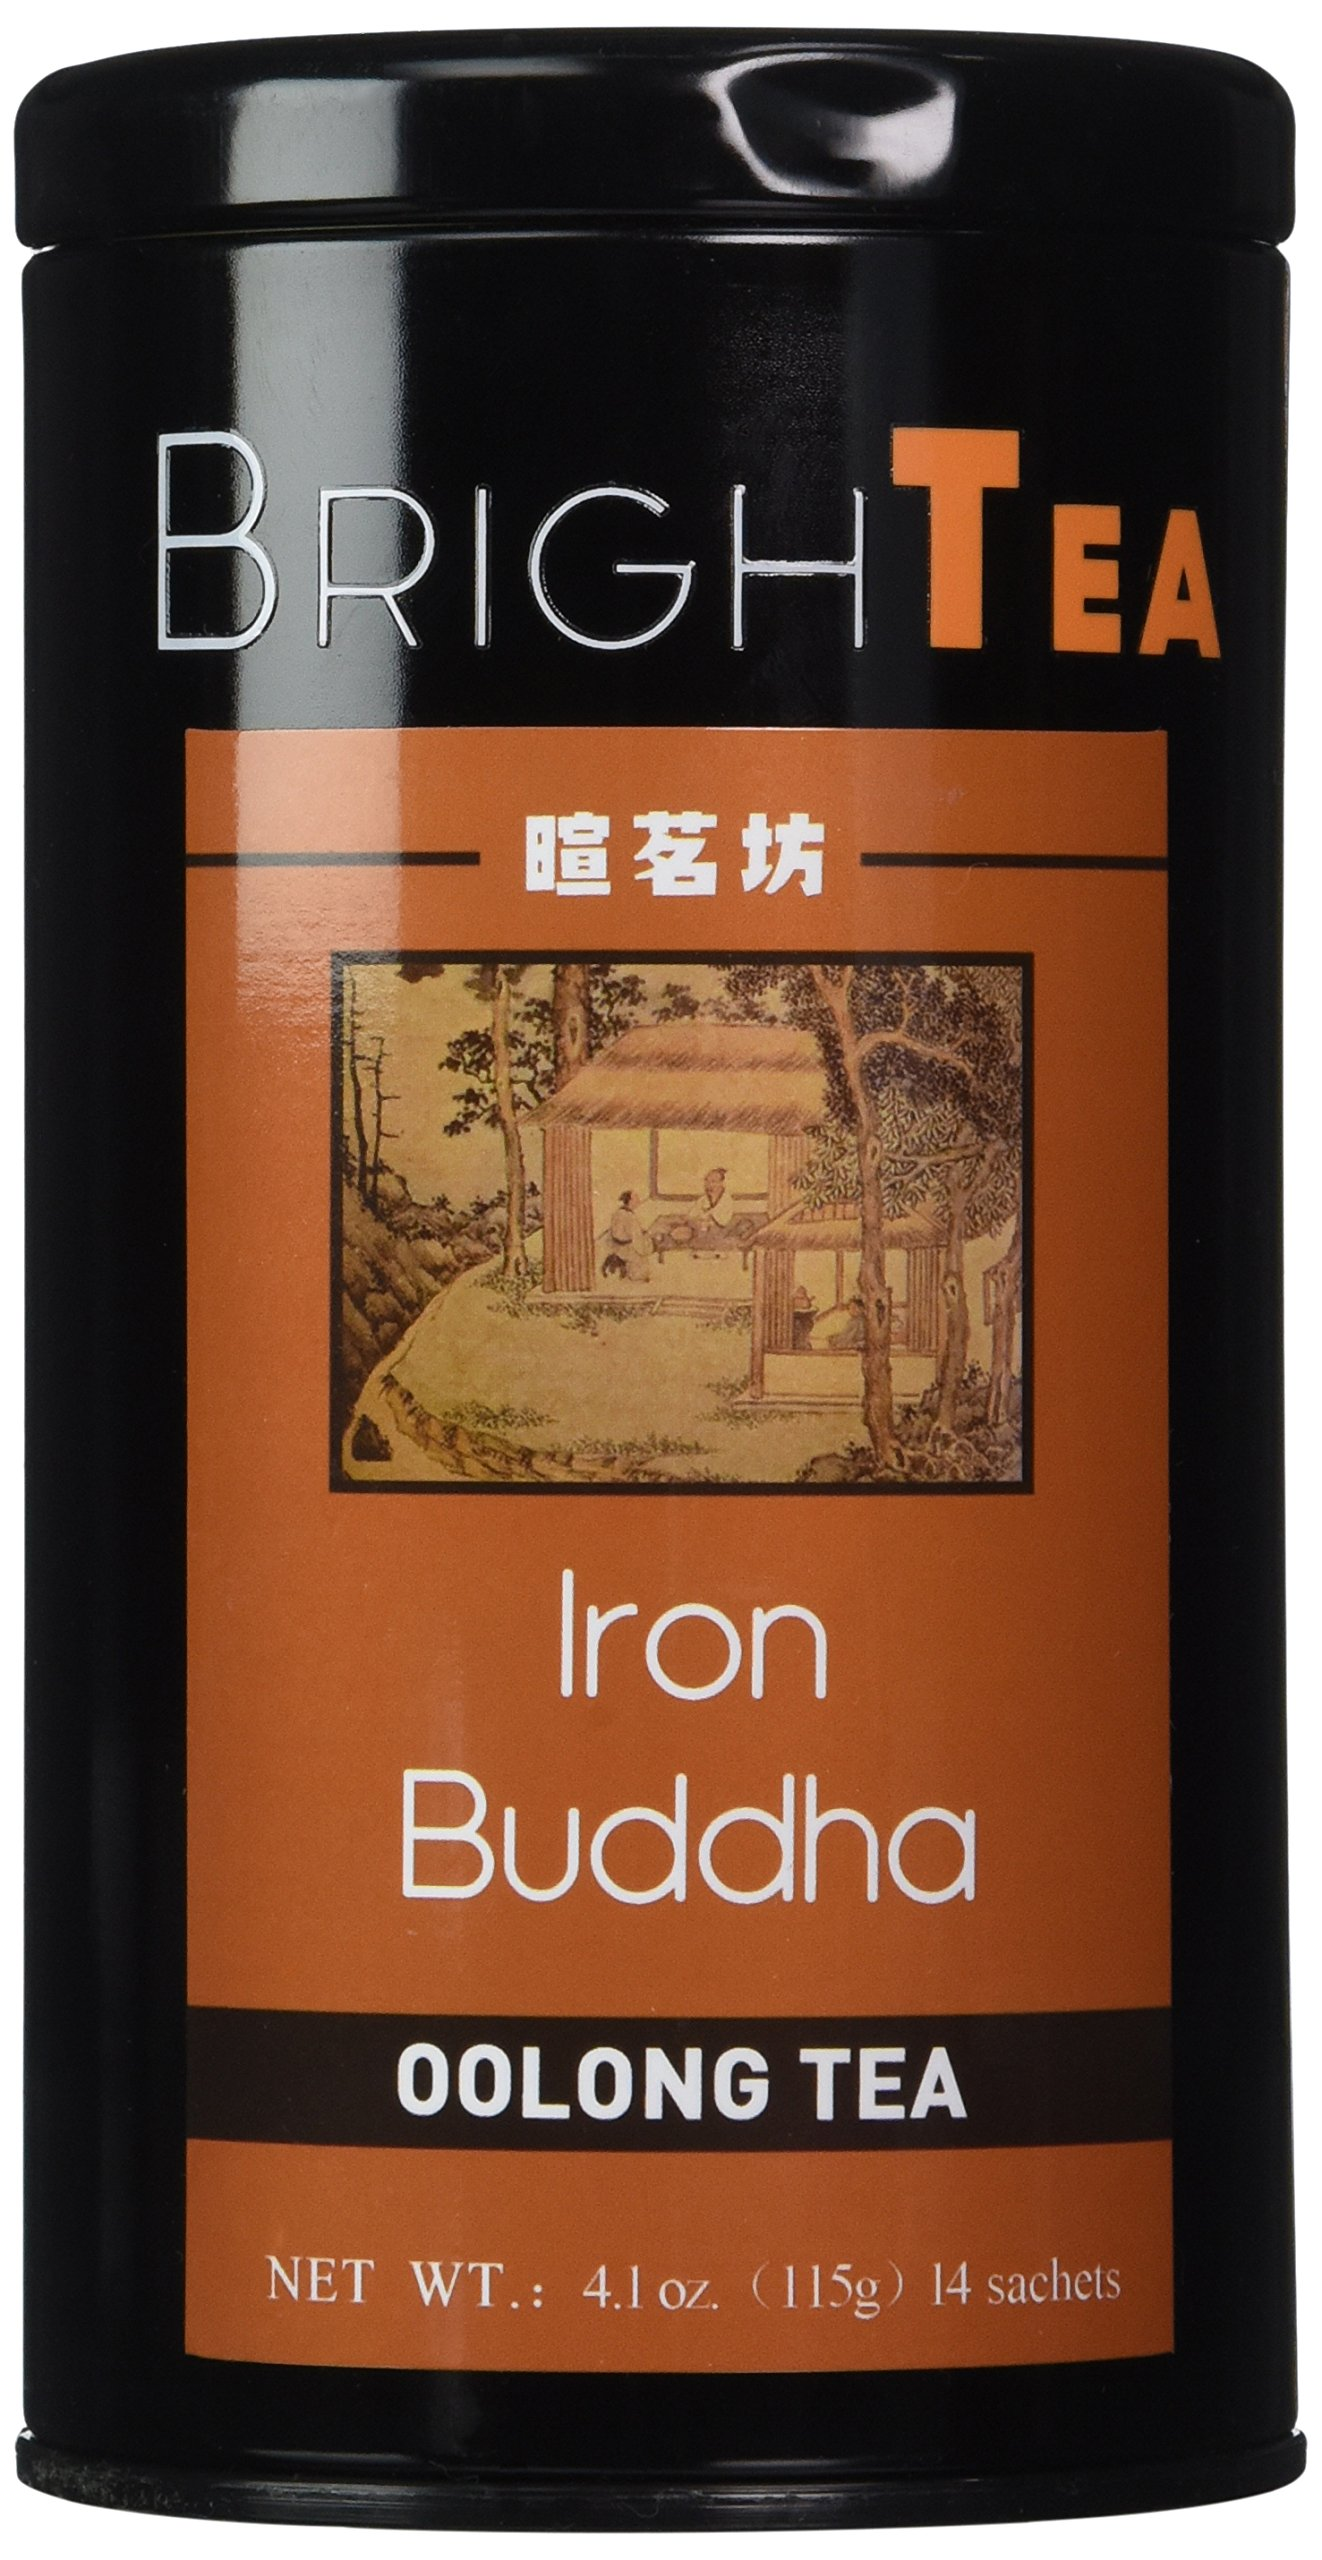 Brightea Monkey Picked Oolong Tea Loose Leaf China Tie Guan Yin Iron Mercy Goddess 4.1 Ounce Tin (Supreme Grade)